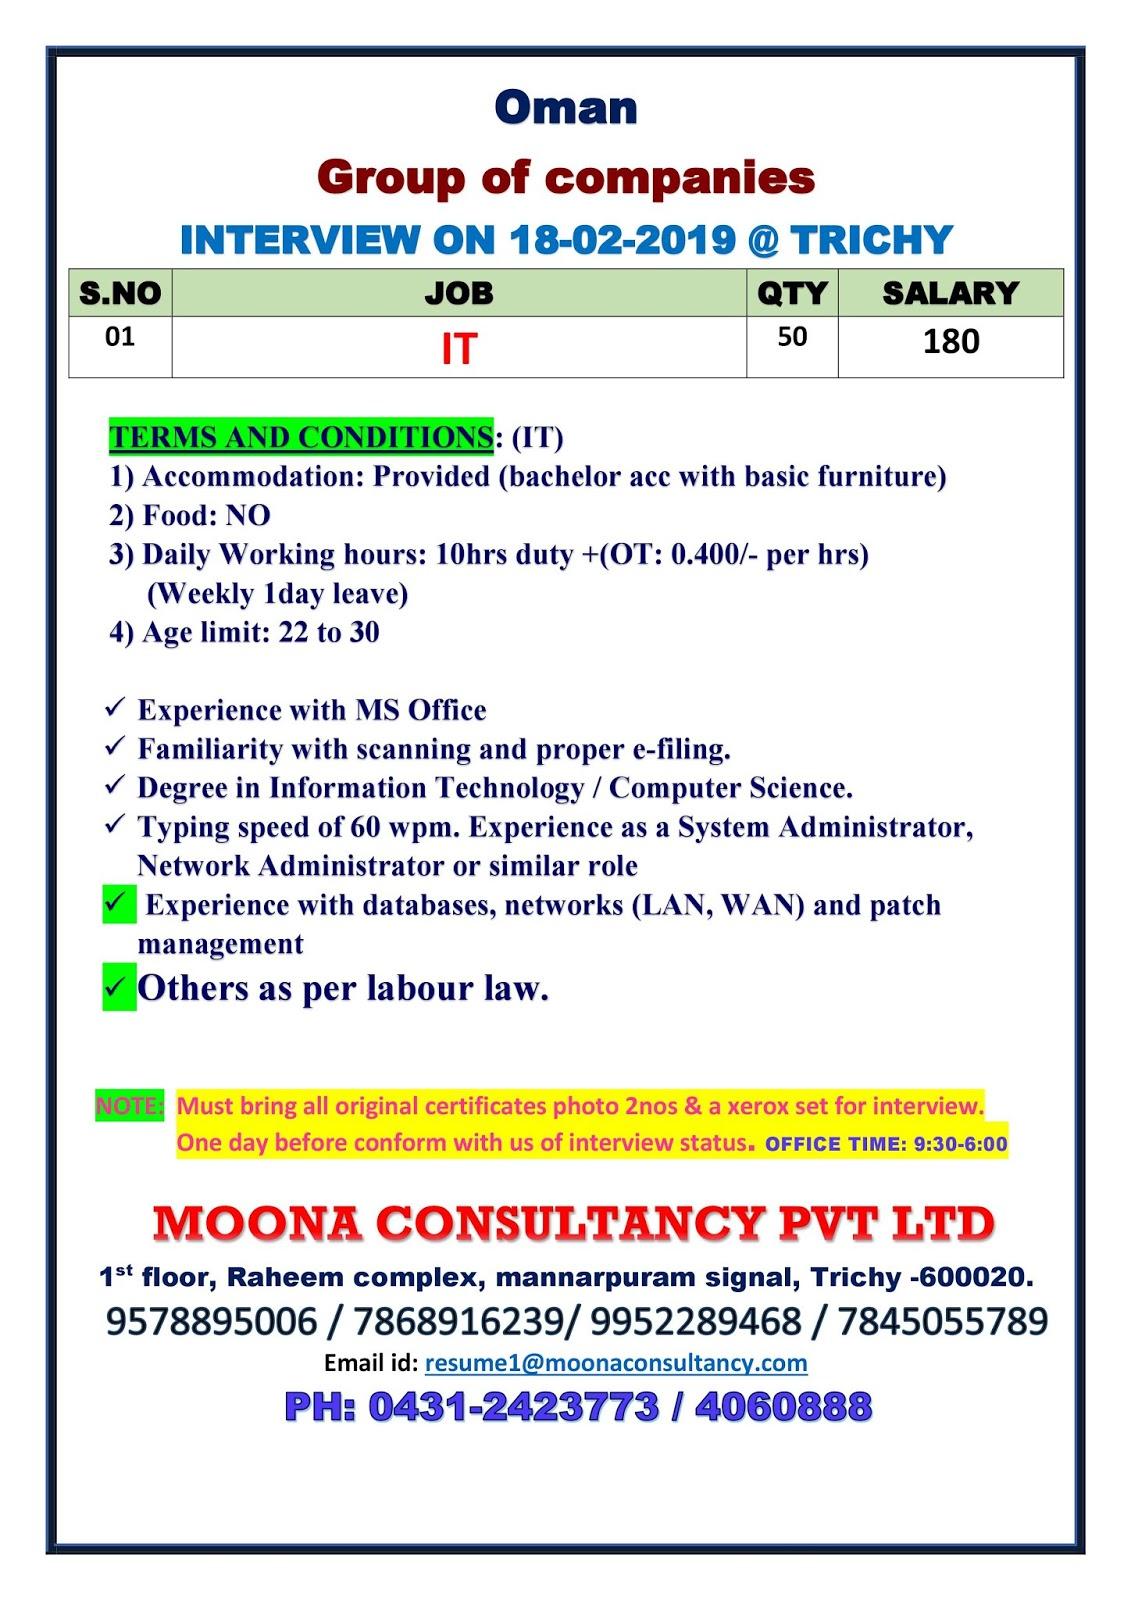 GROUP OF COMPANIES OMAN 18-02-2019 | Moona Consultancy